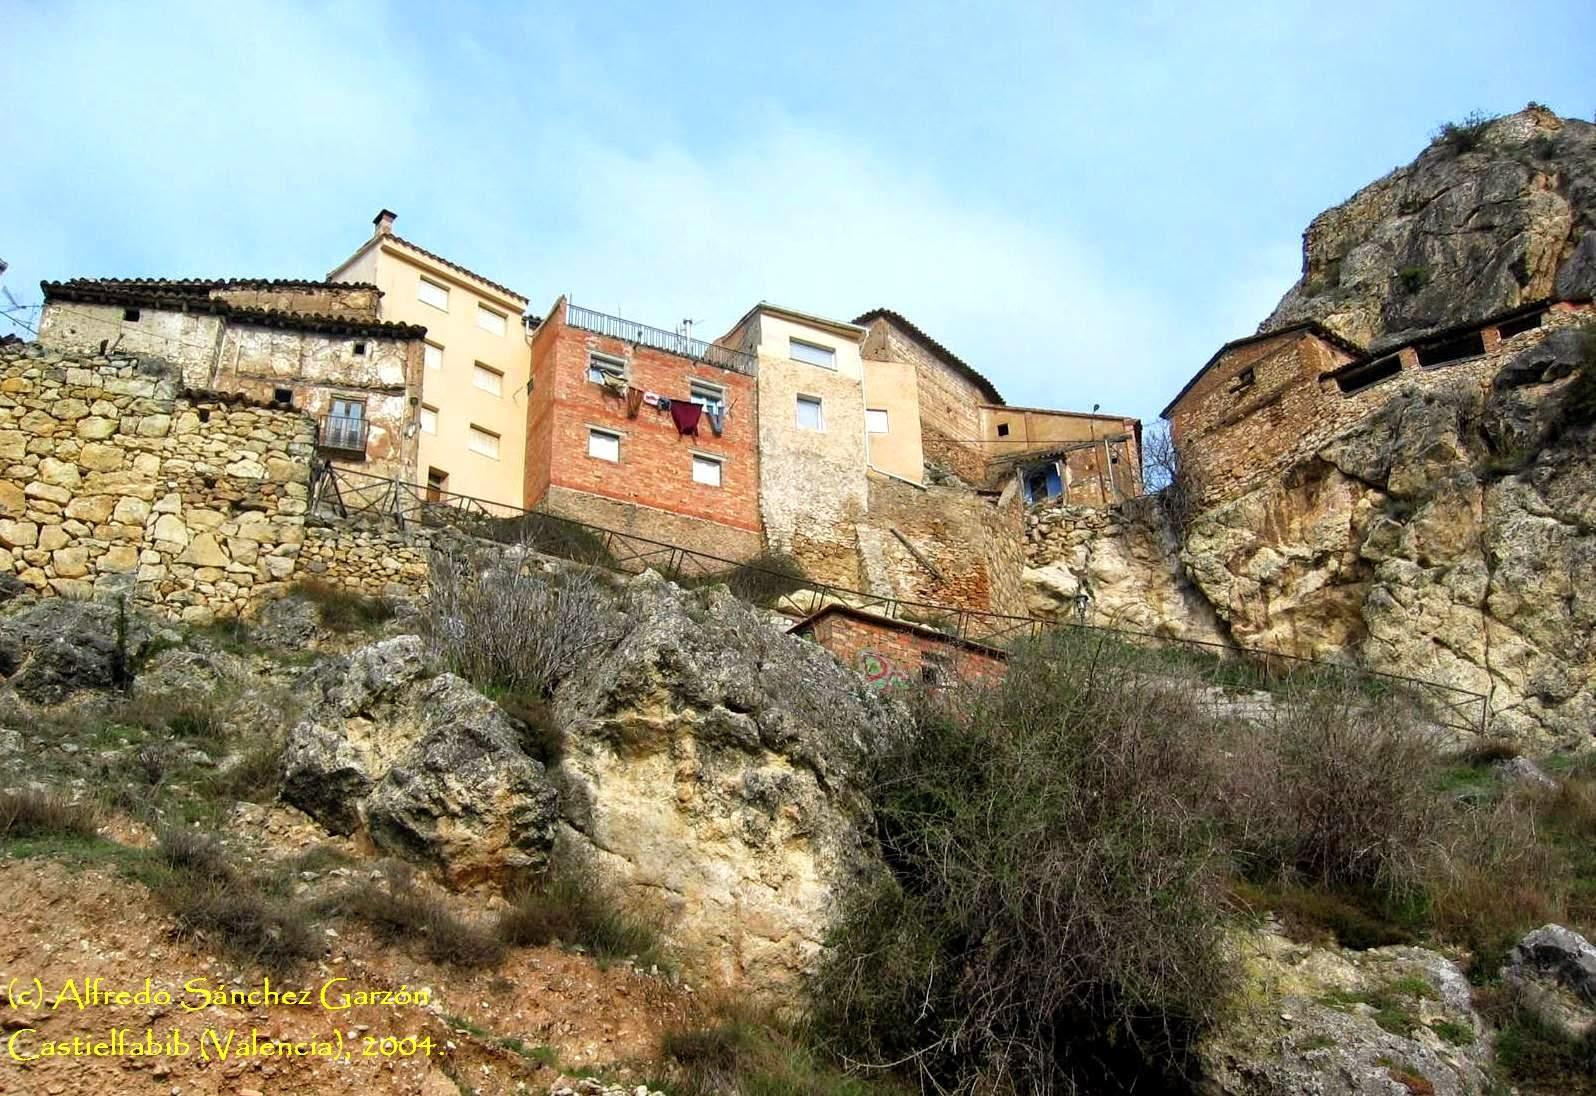 castielfabib-caserio-murallas-valencia